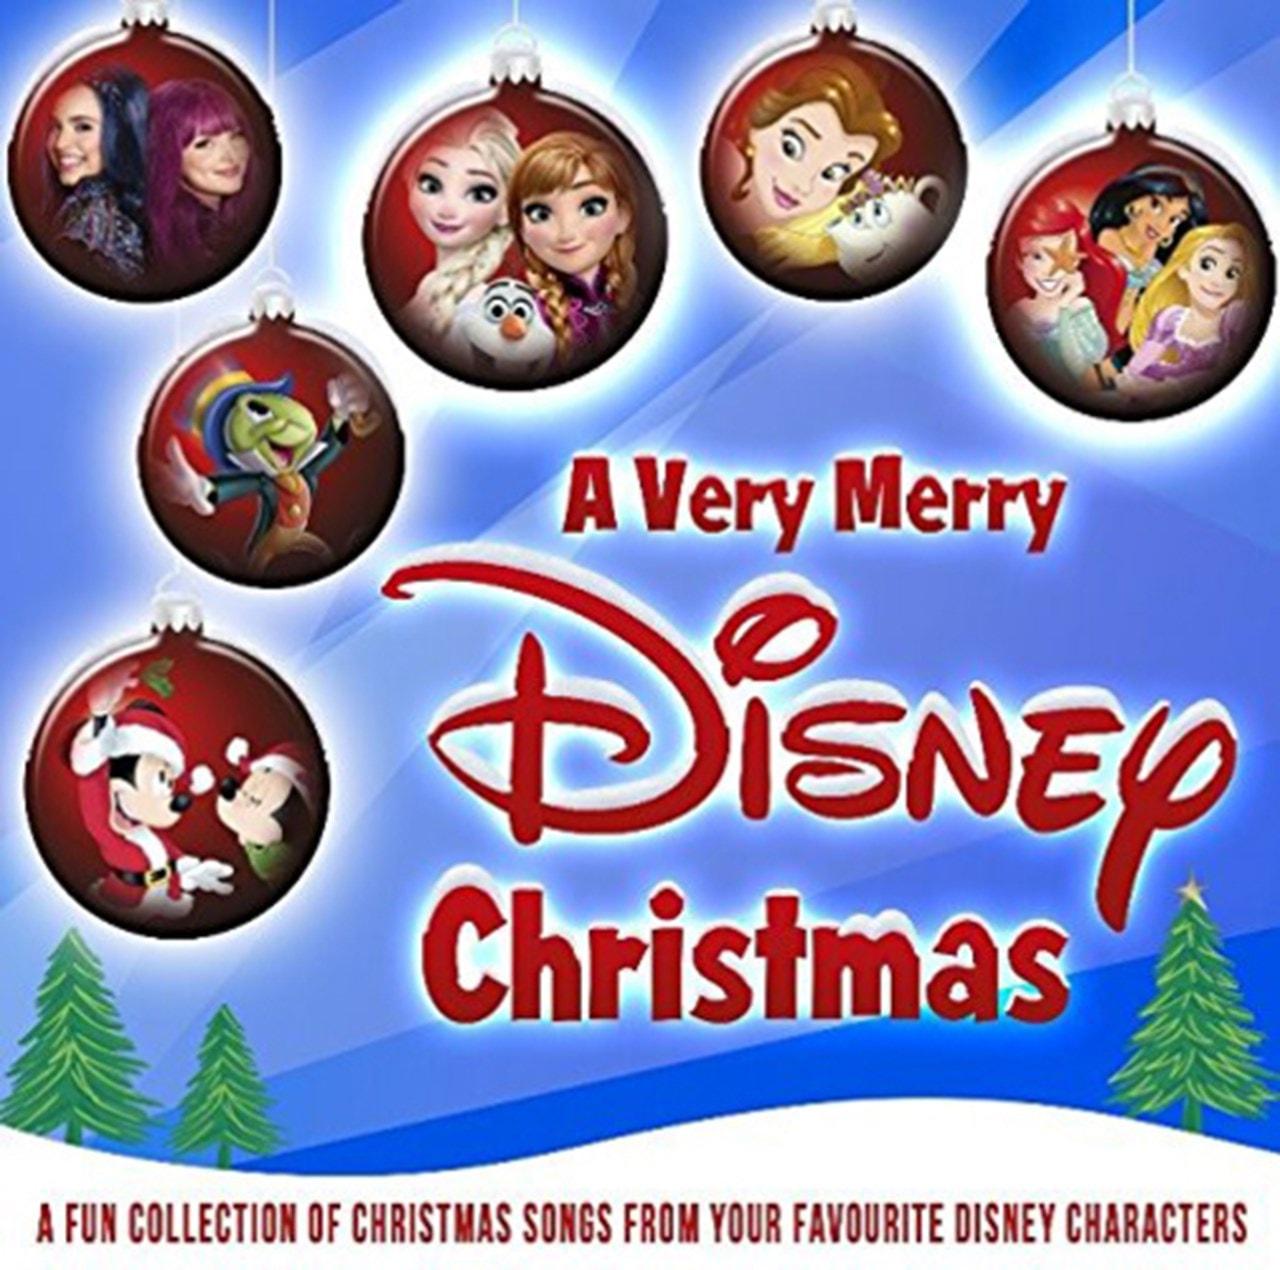 A Very Merry Disney Christmas - 1